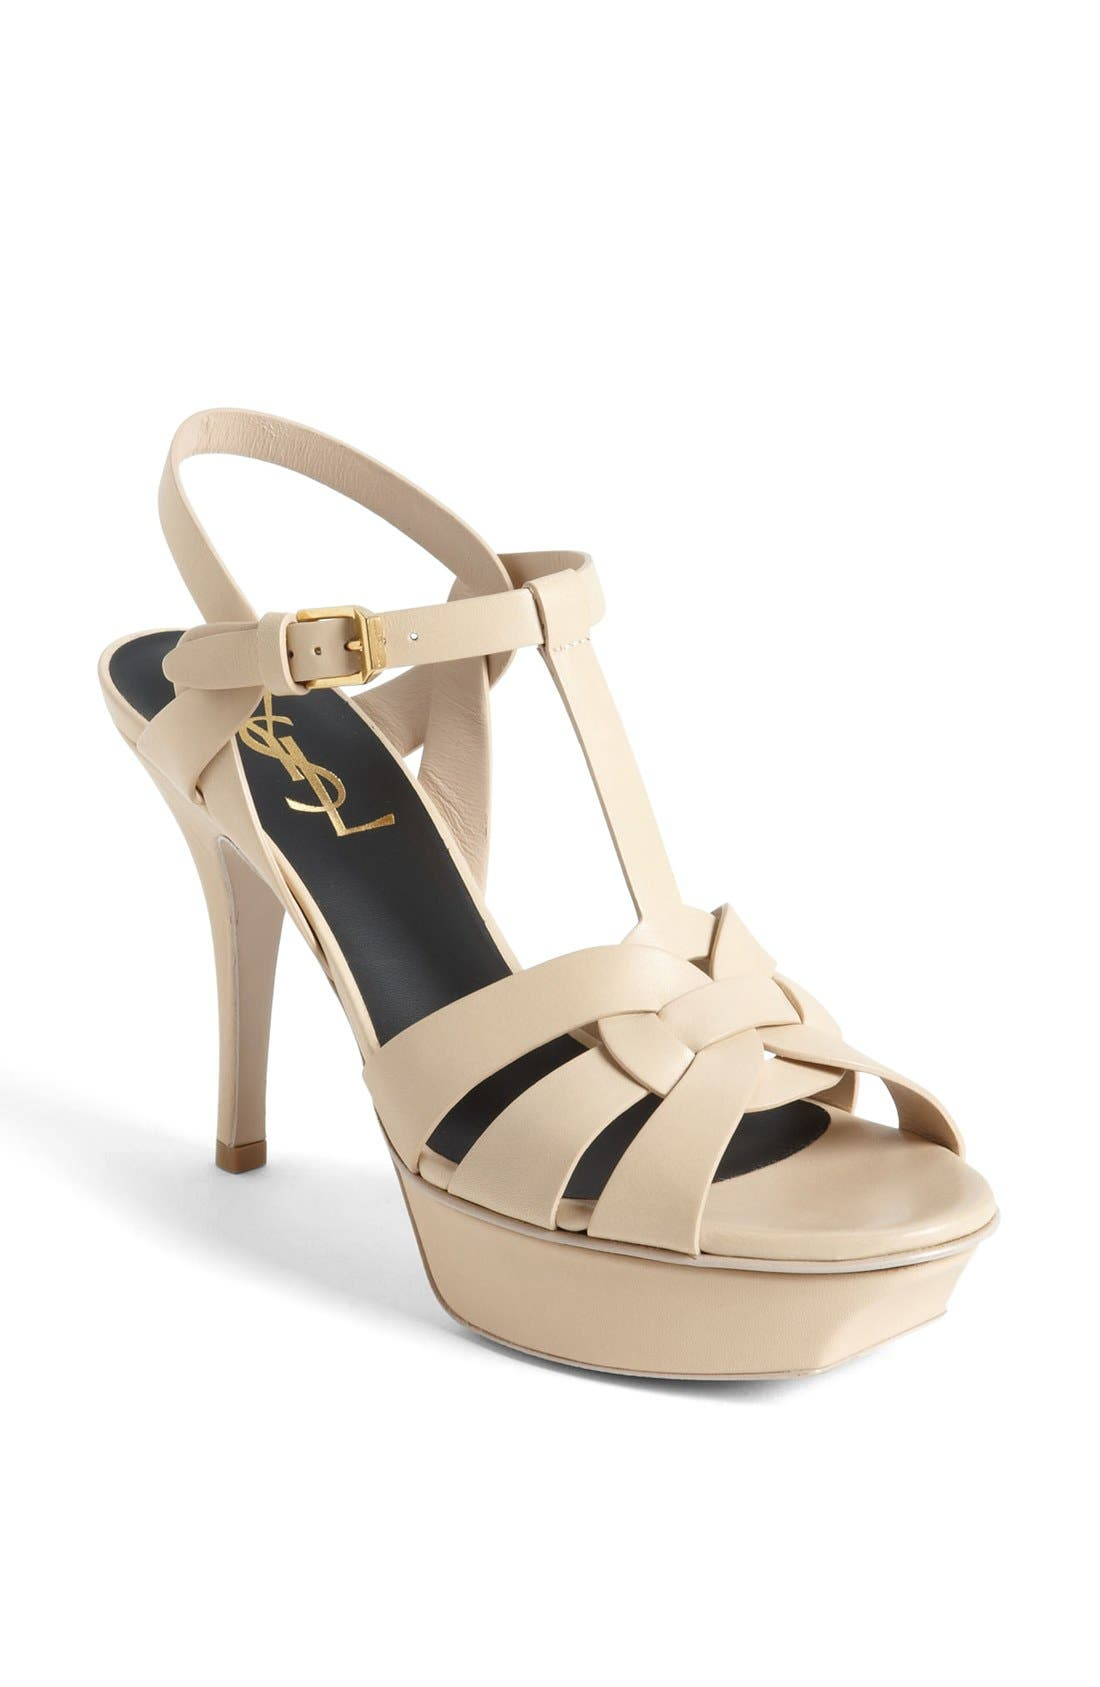 Alternate Image 1 Selected - Saint Laurent 'Tribute' Sandal (Women)